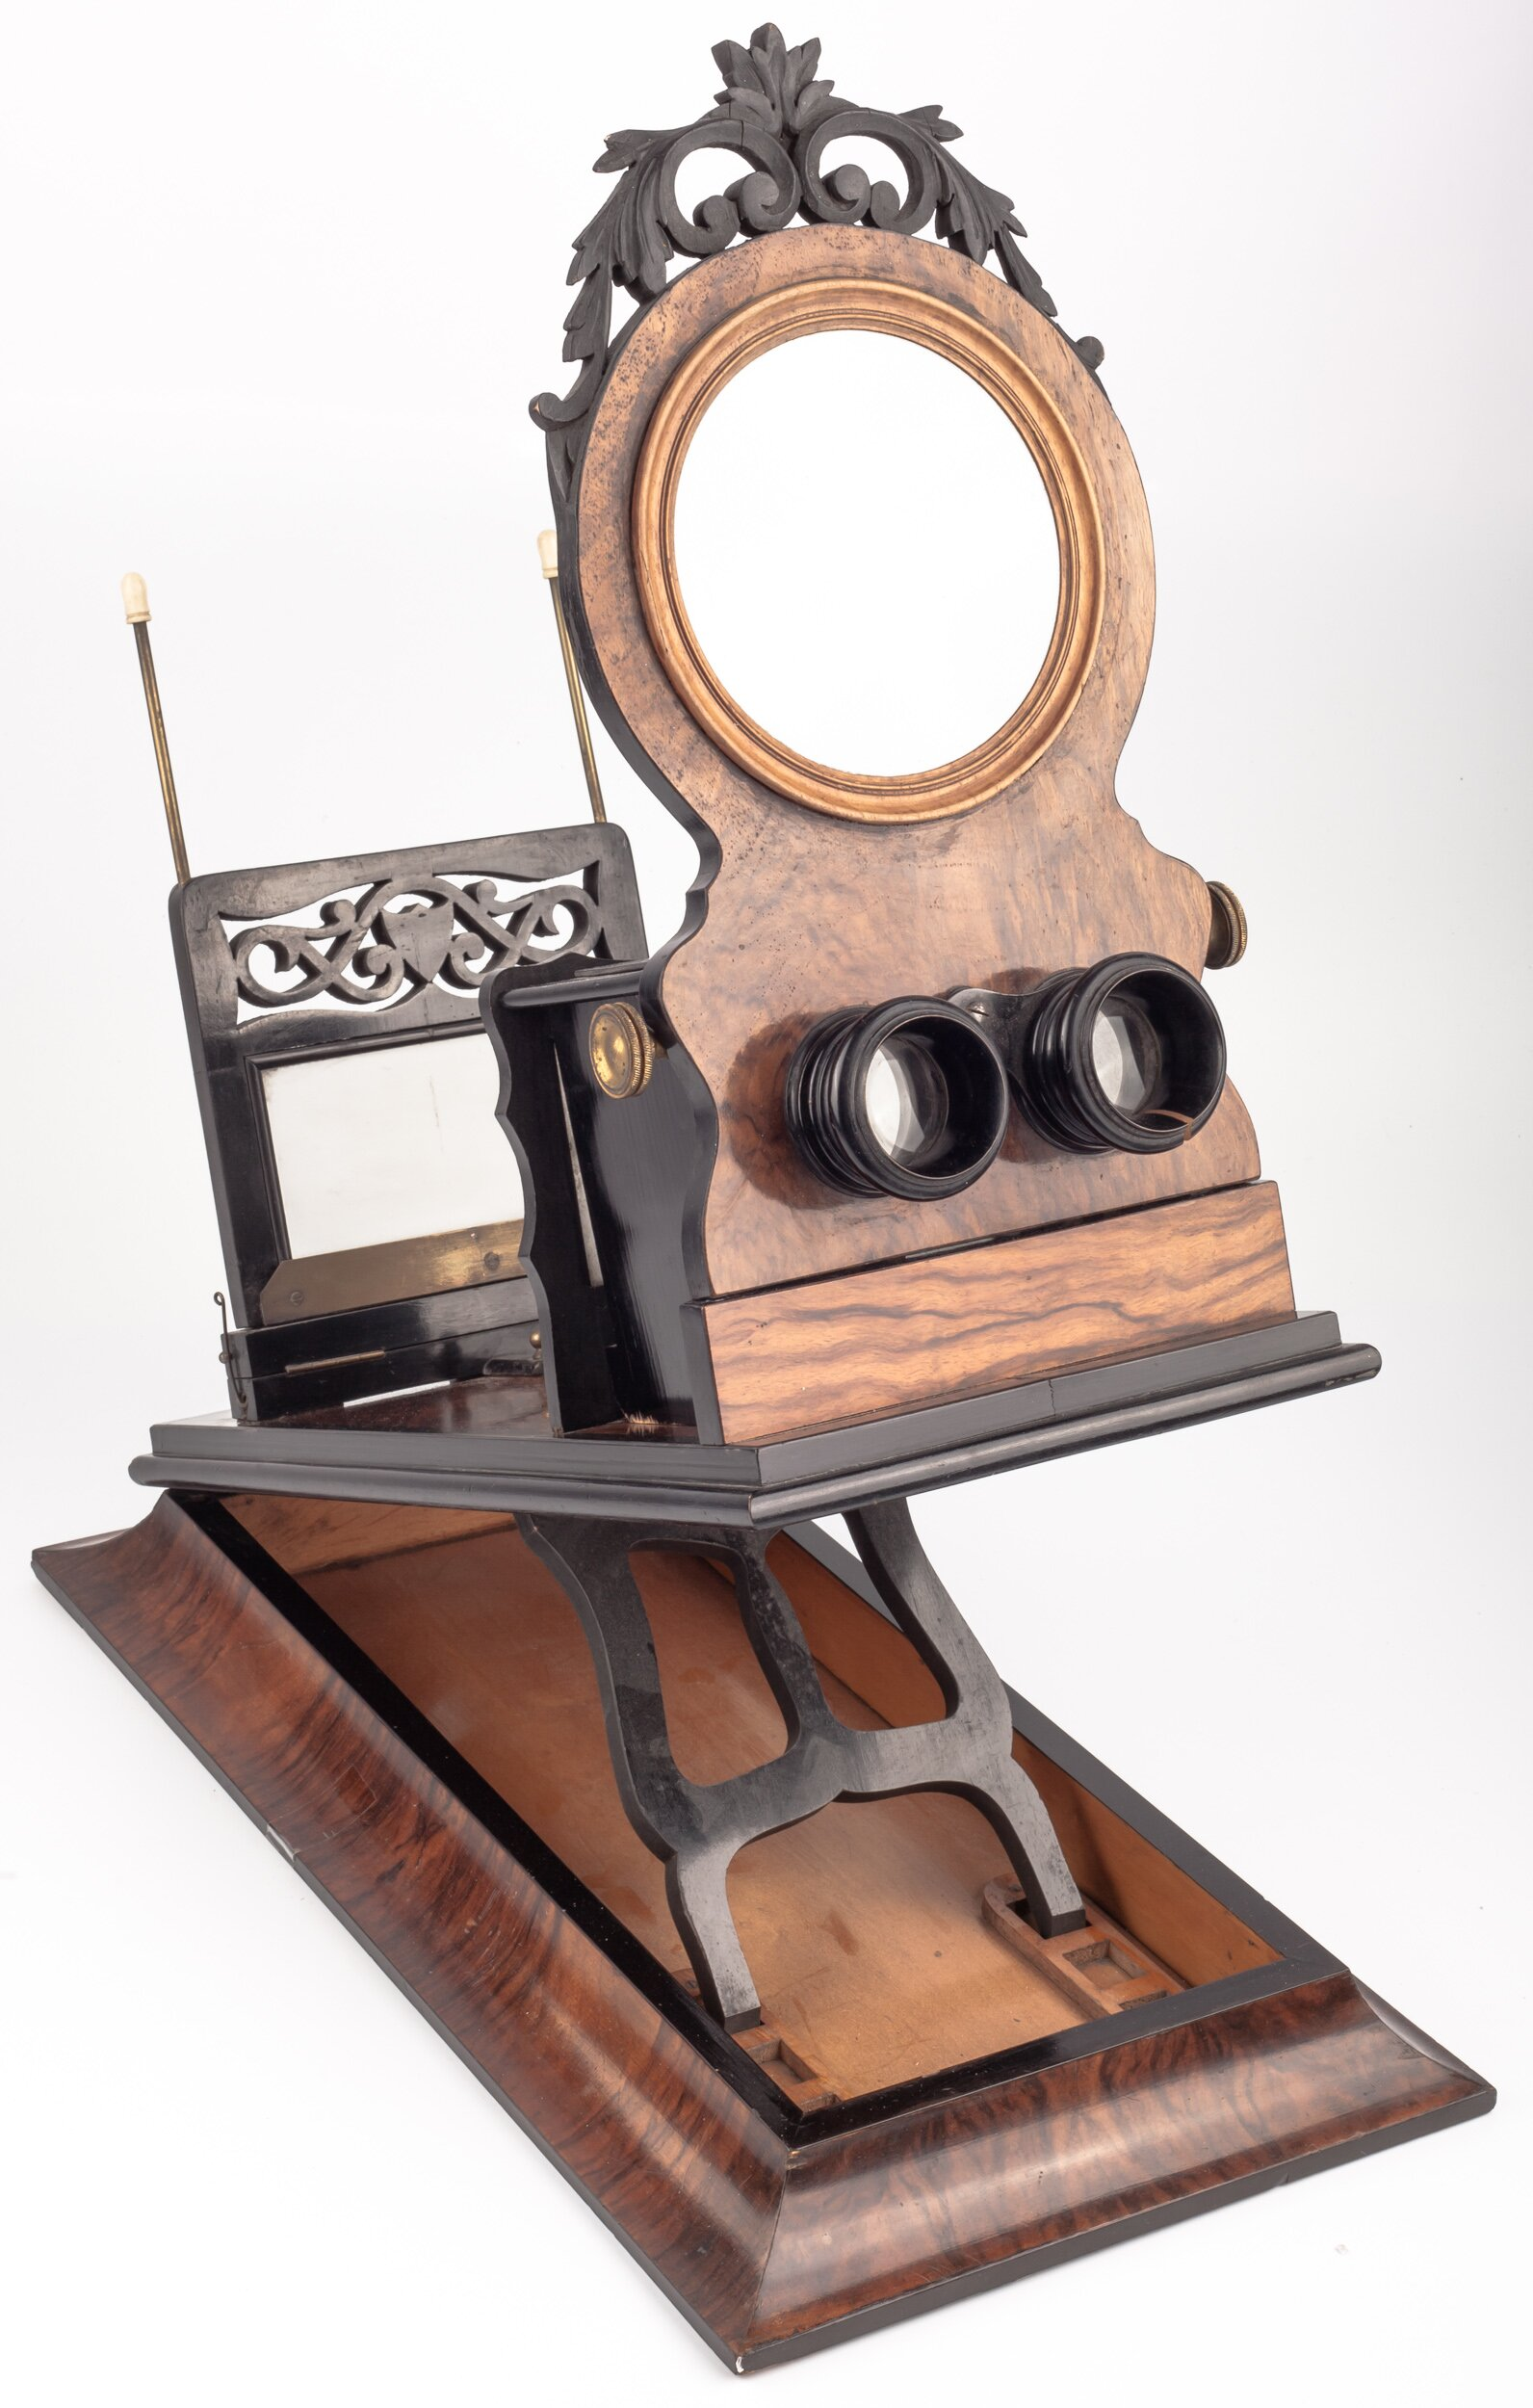 Antiker Stereobetrachter